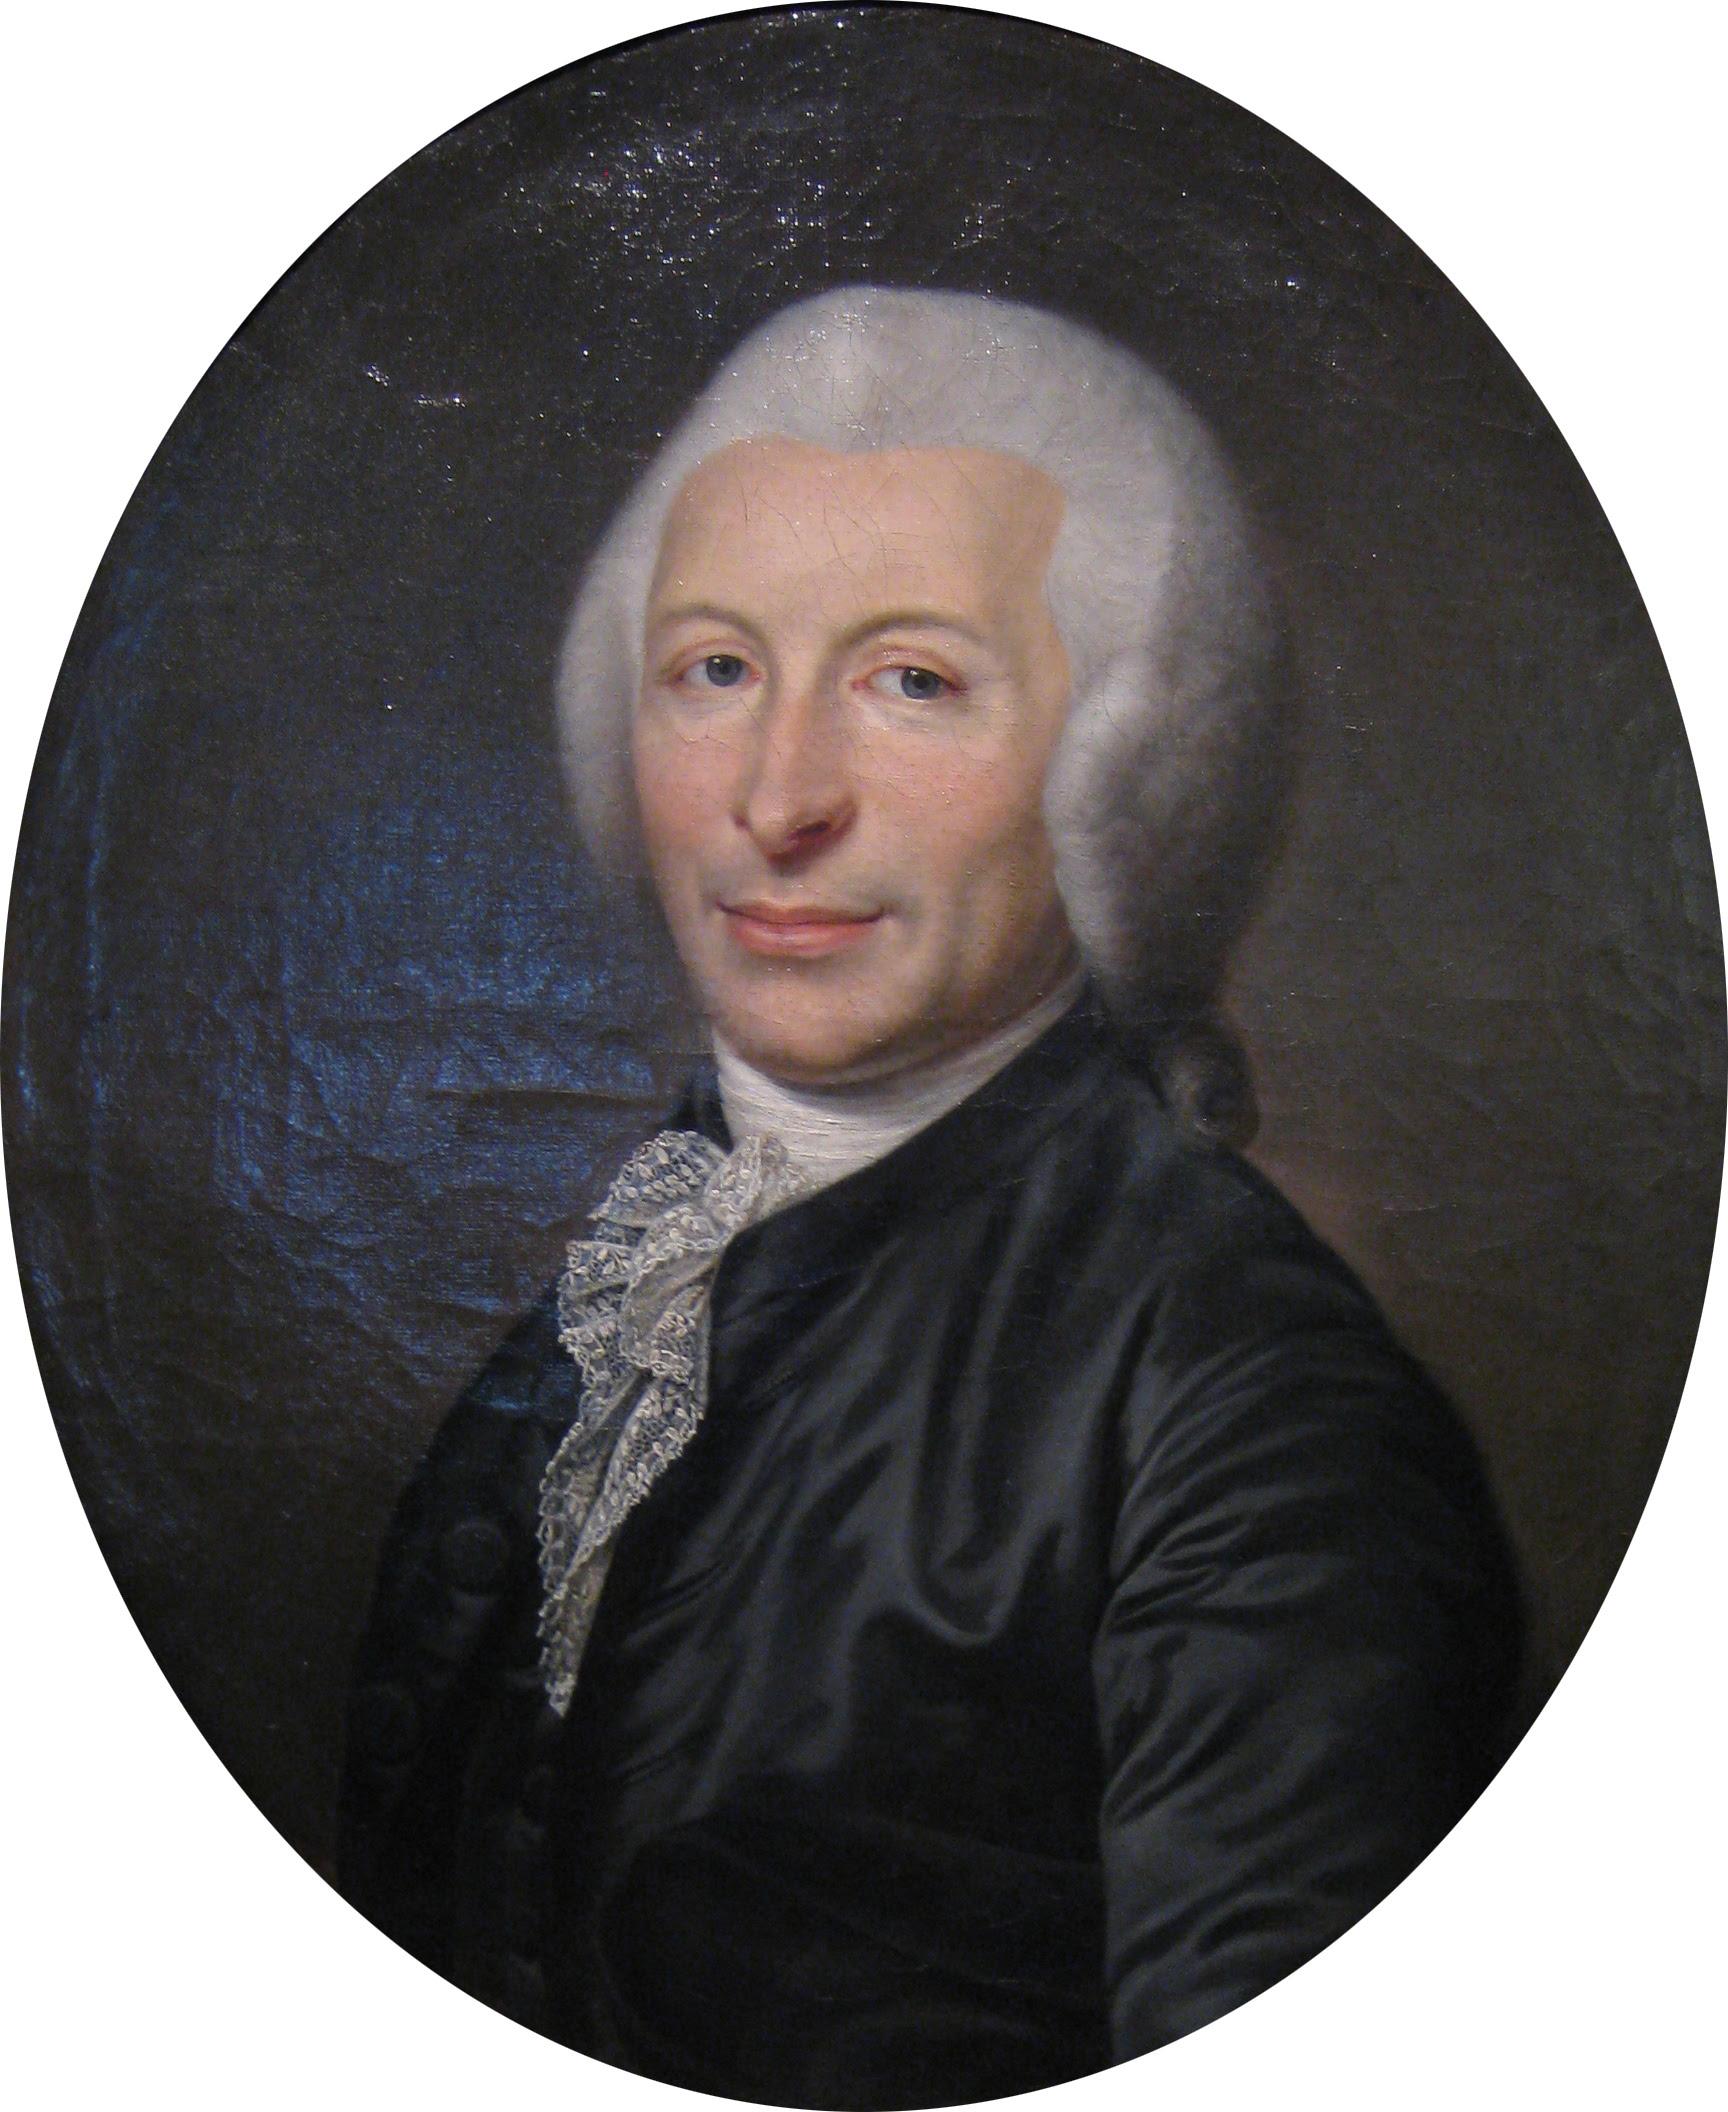 Dr. Joseph-Ignace Guillotin